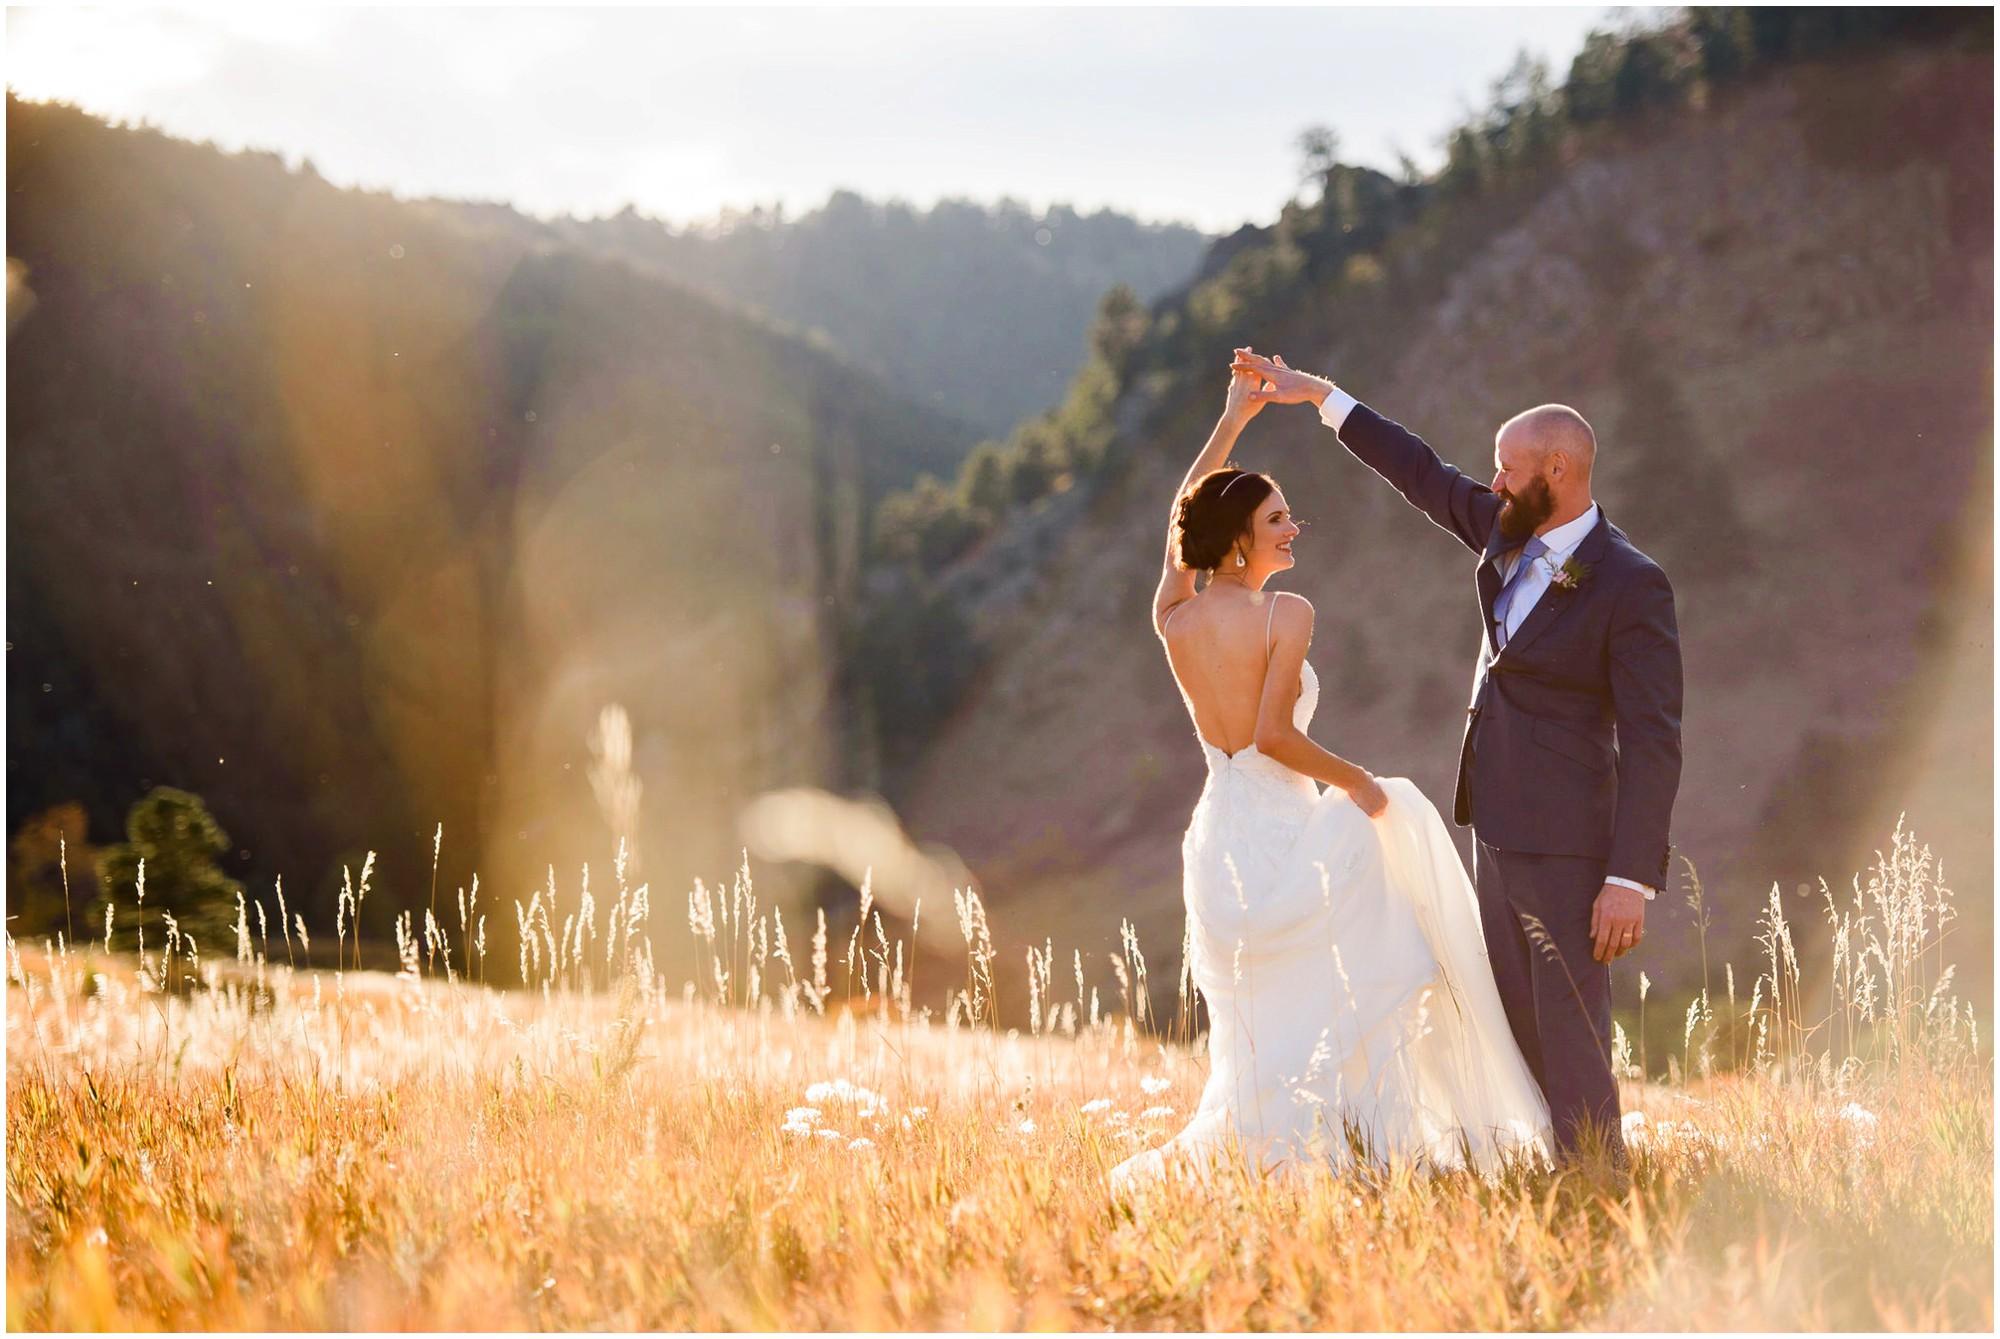 773-Boulder-Colorado-Fall-wedding-photography-king.jpg